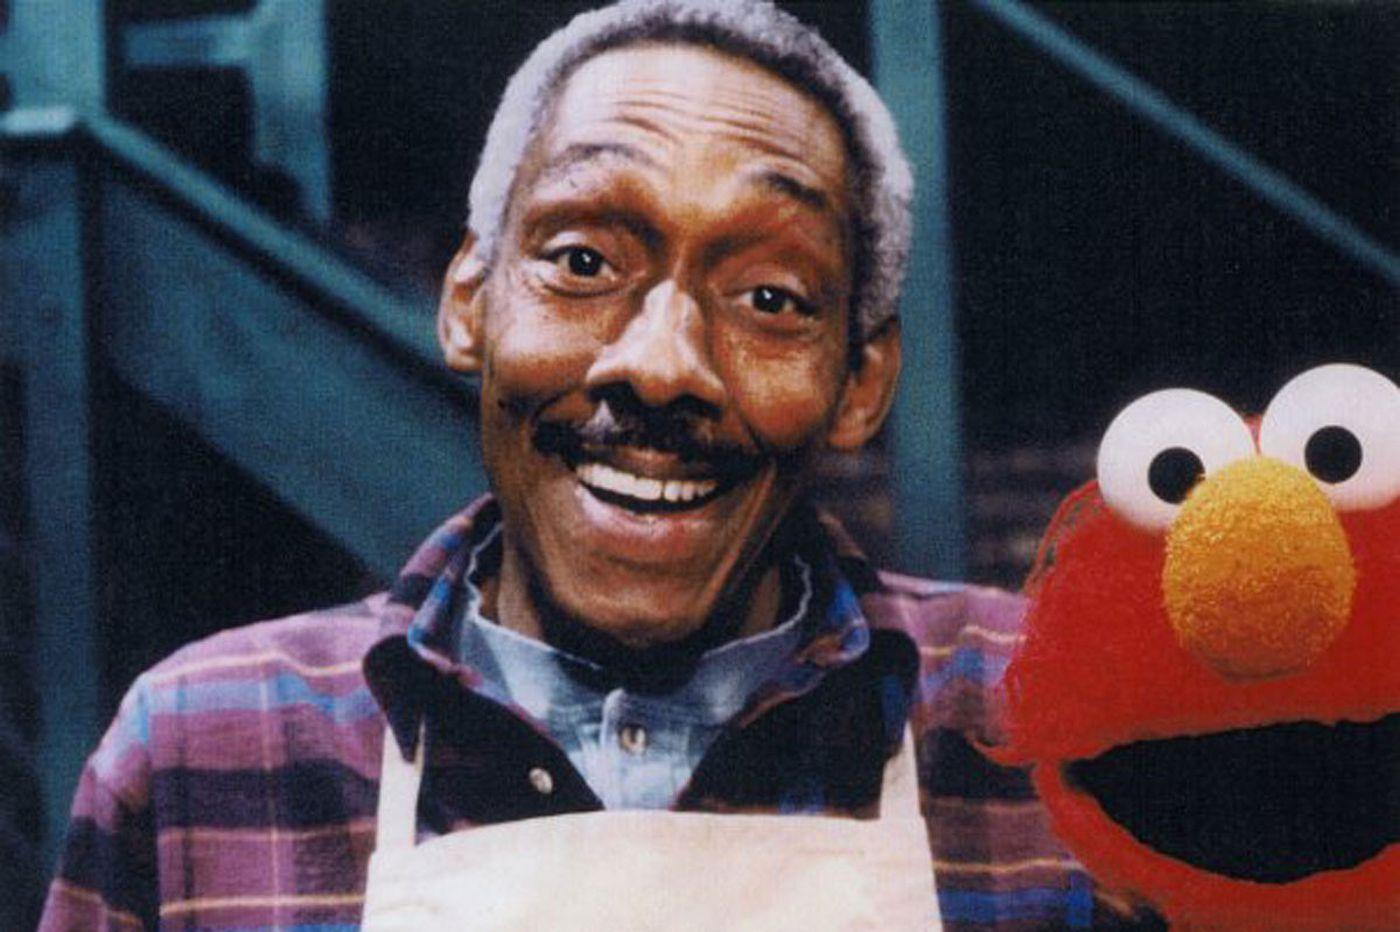 David L. Smyrl, Mr. Handford on 'Sesame Street'